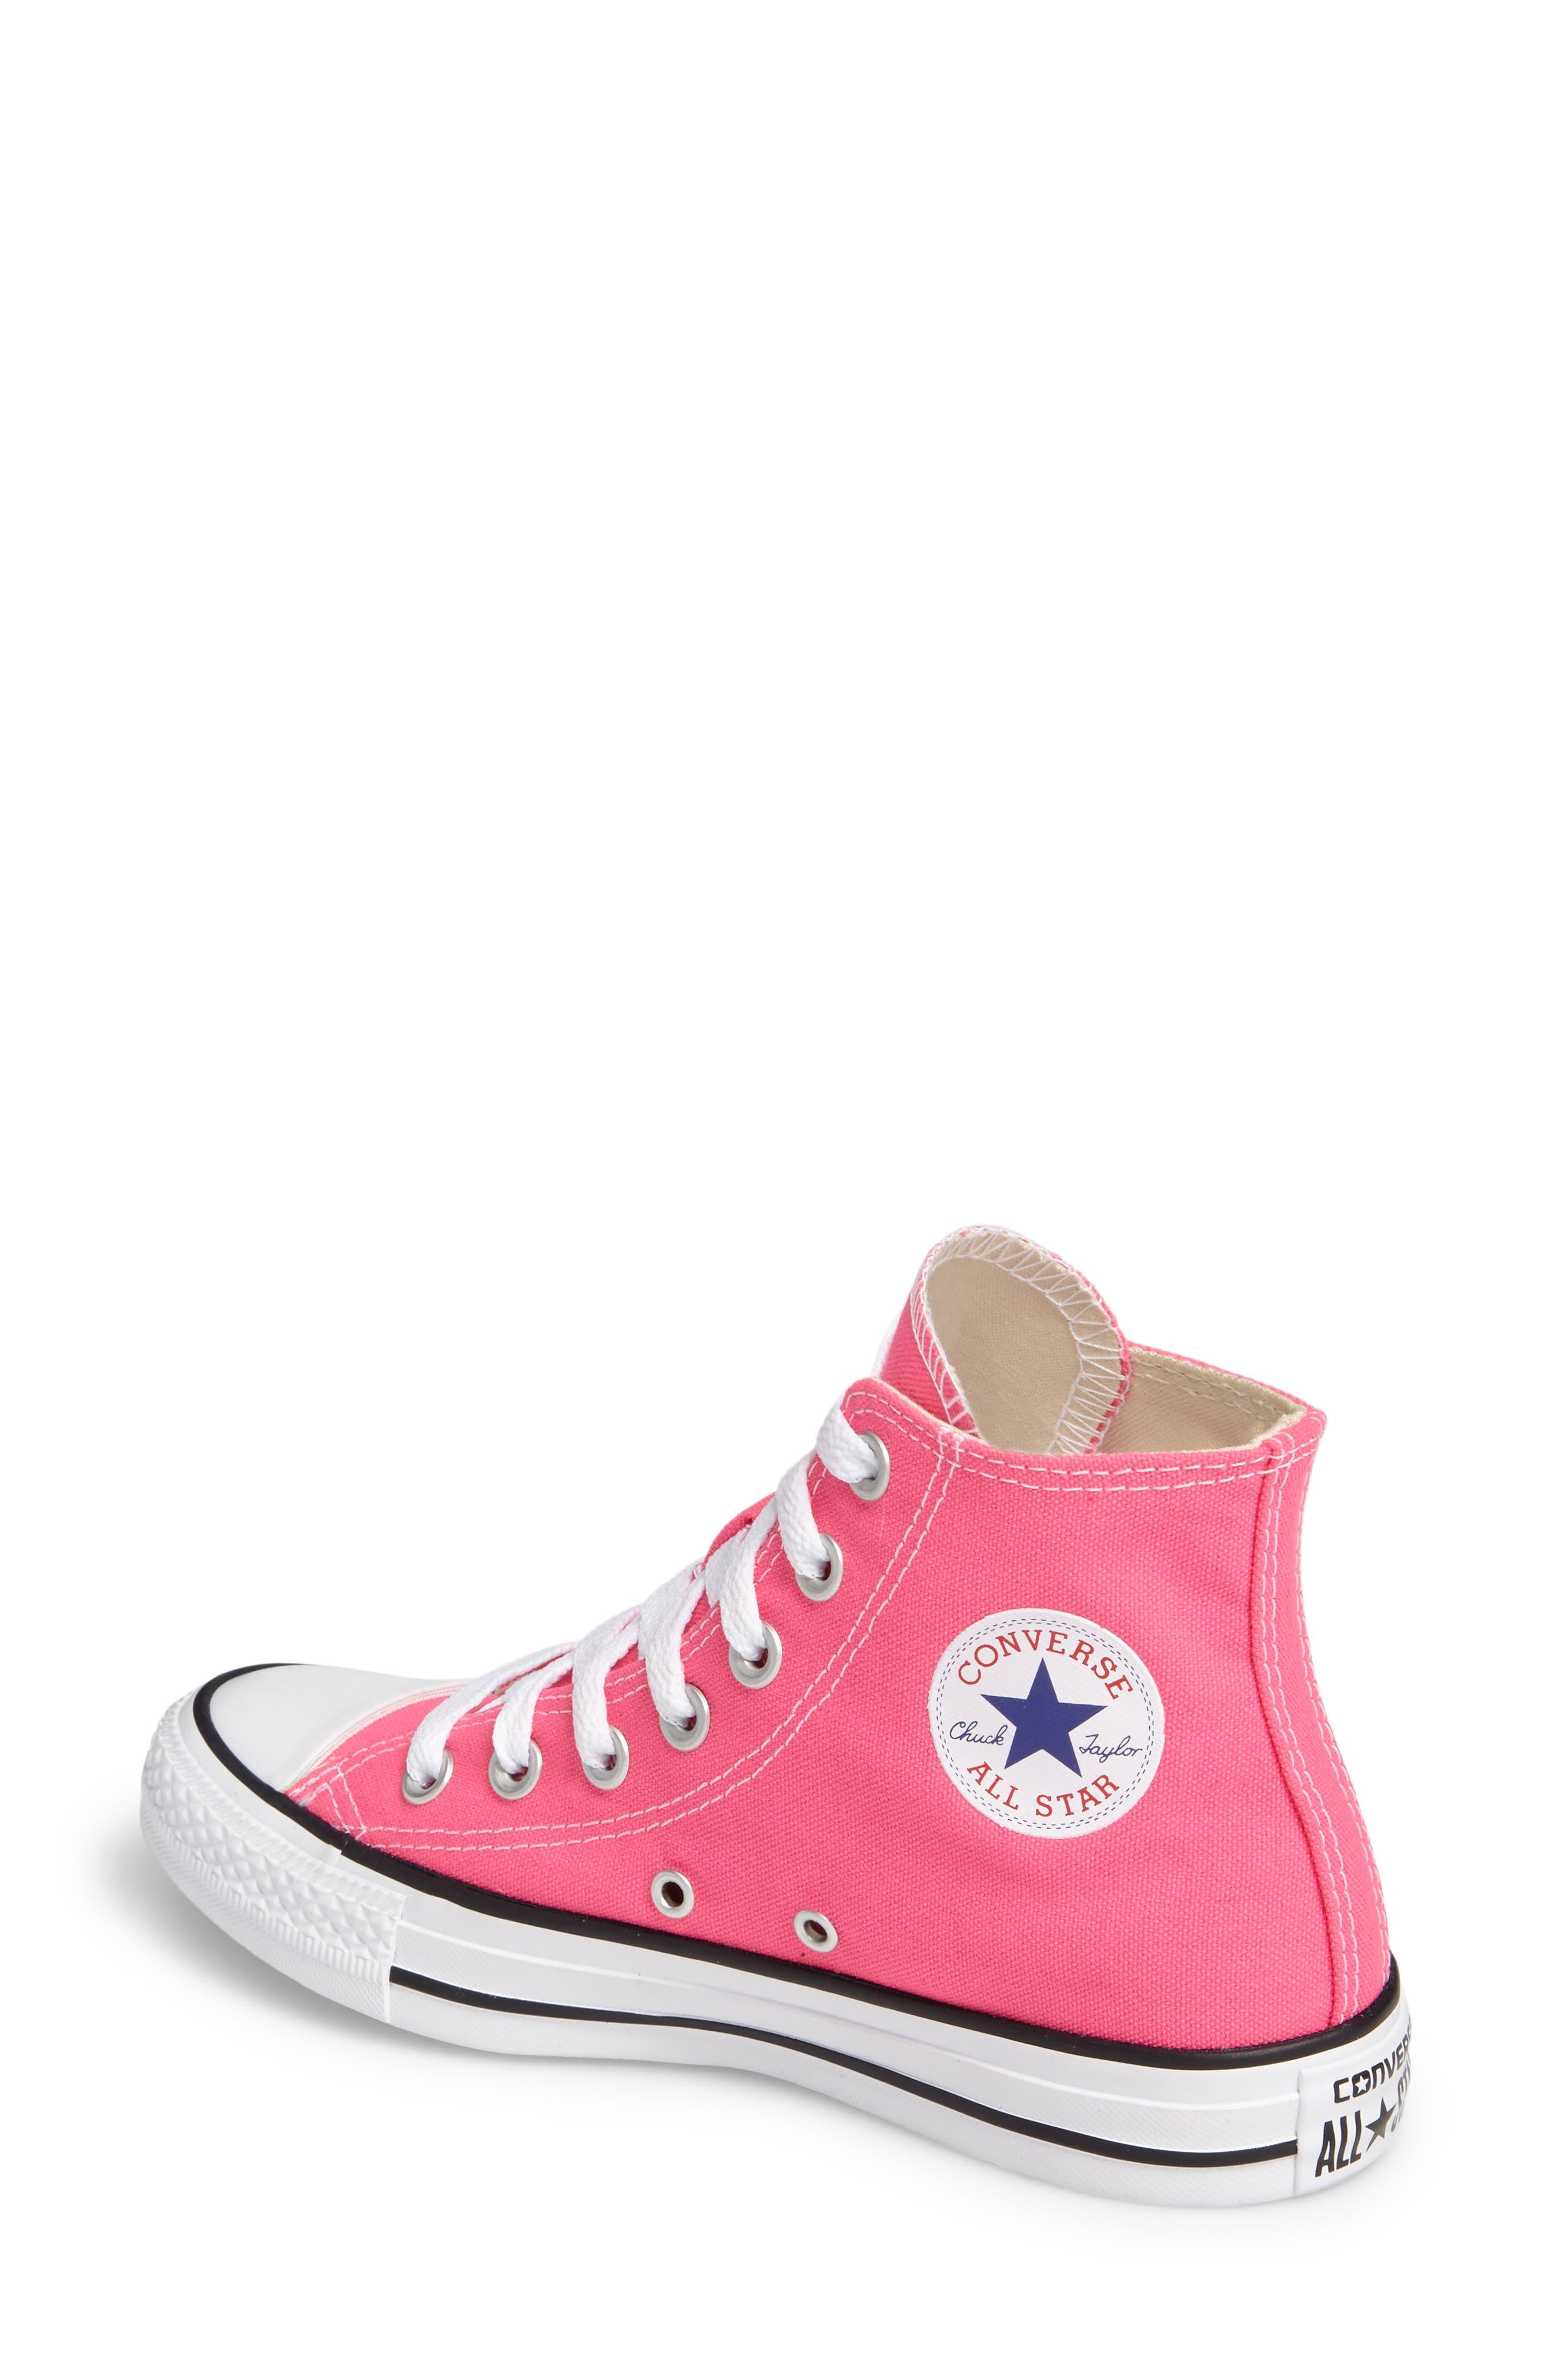 Alternate Image 2  - Converse Chuck Taylor® All Star® Seasonal Hi Sneaker (Women)